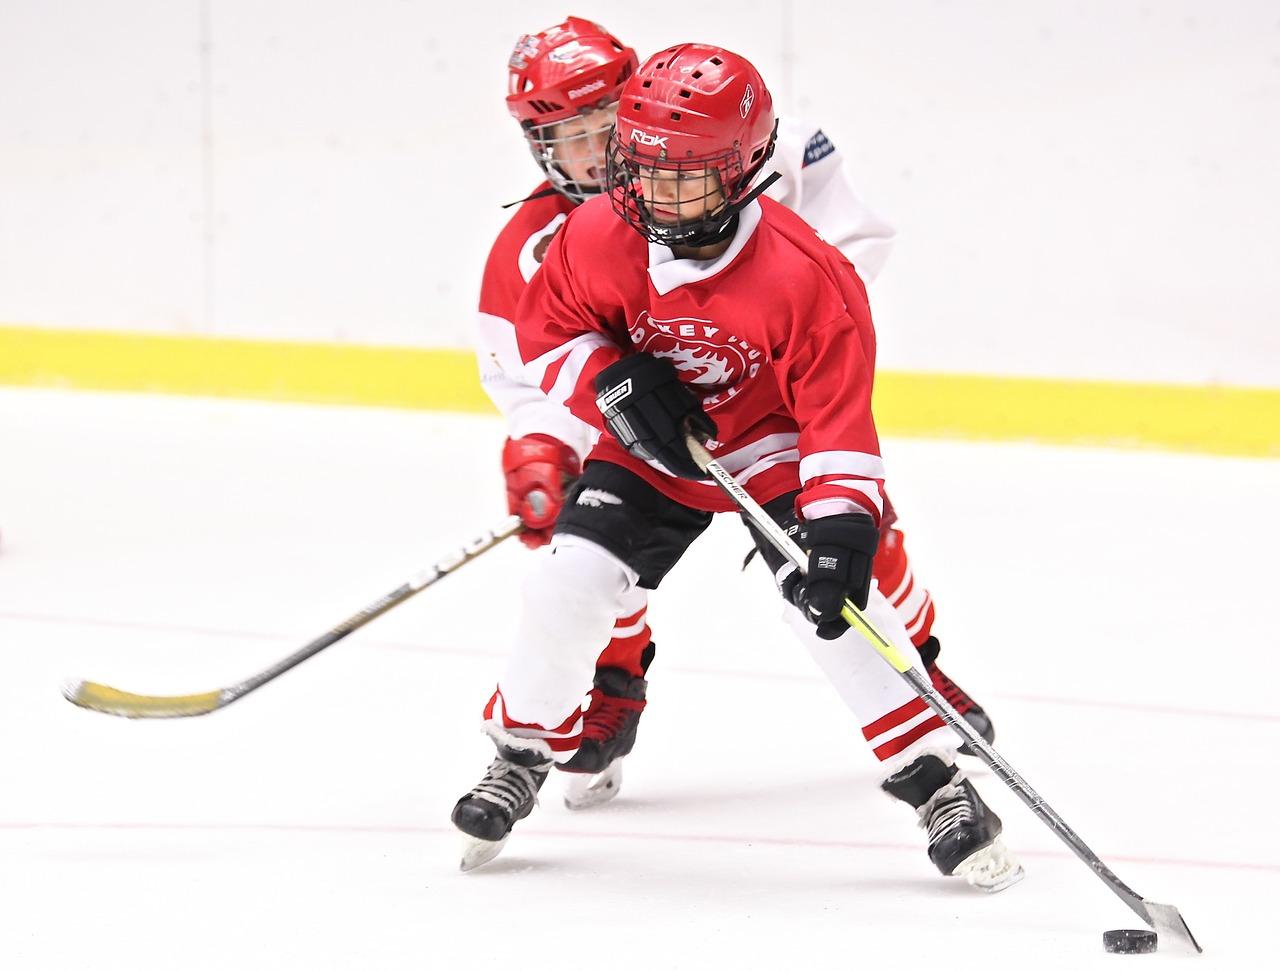 hockey-2274221_1280.jpg